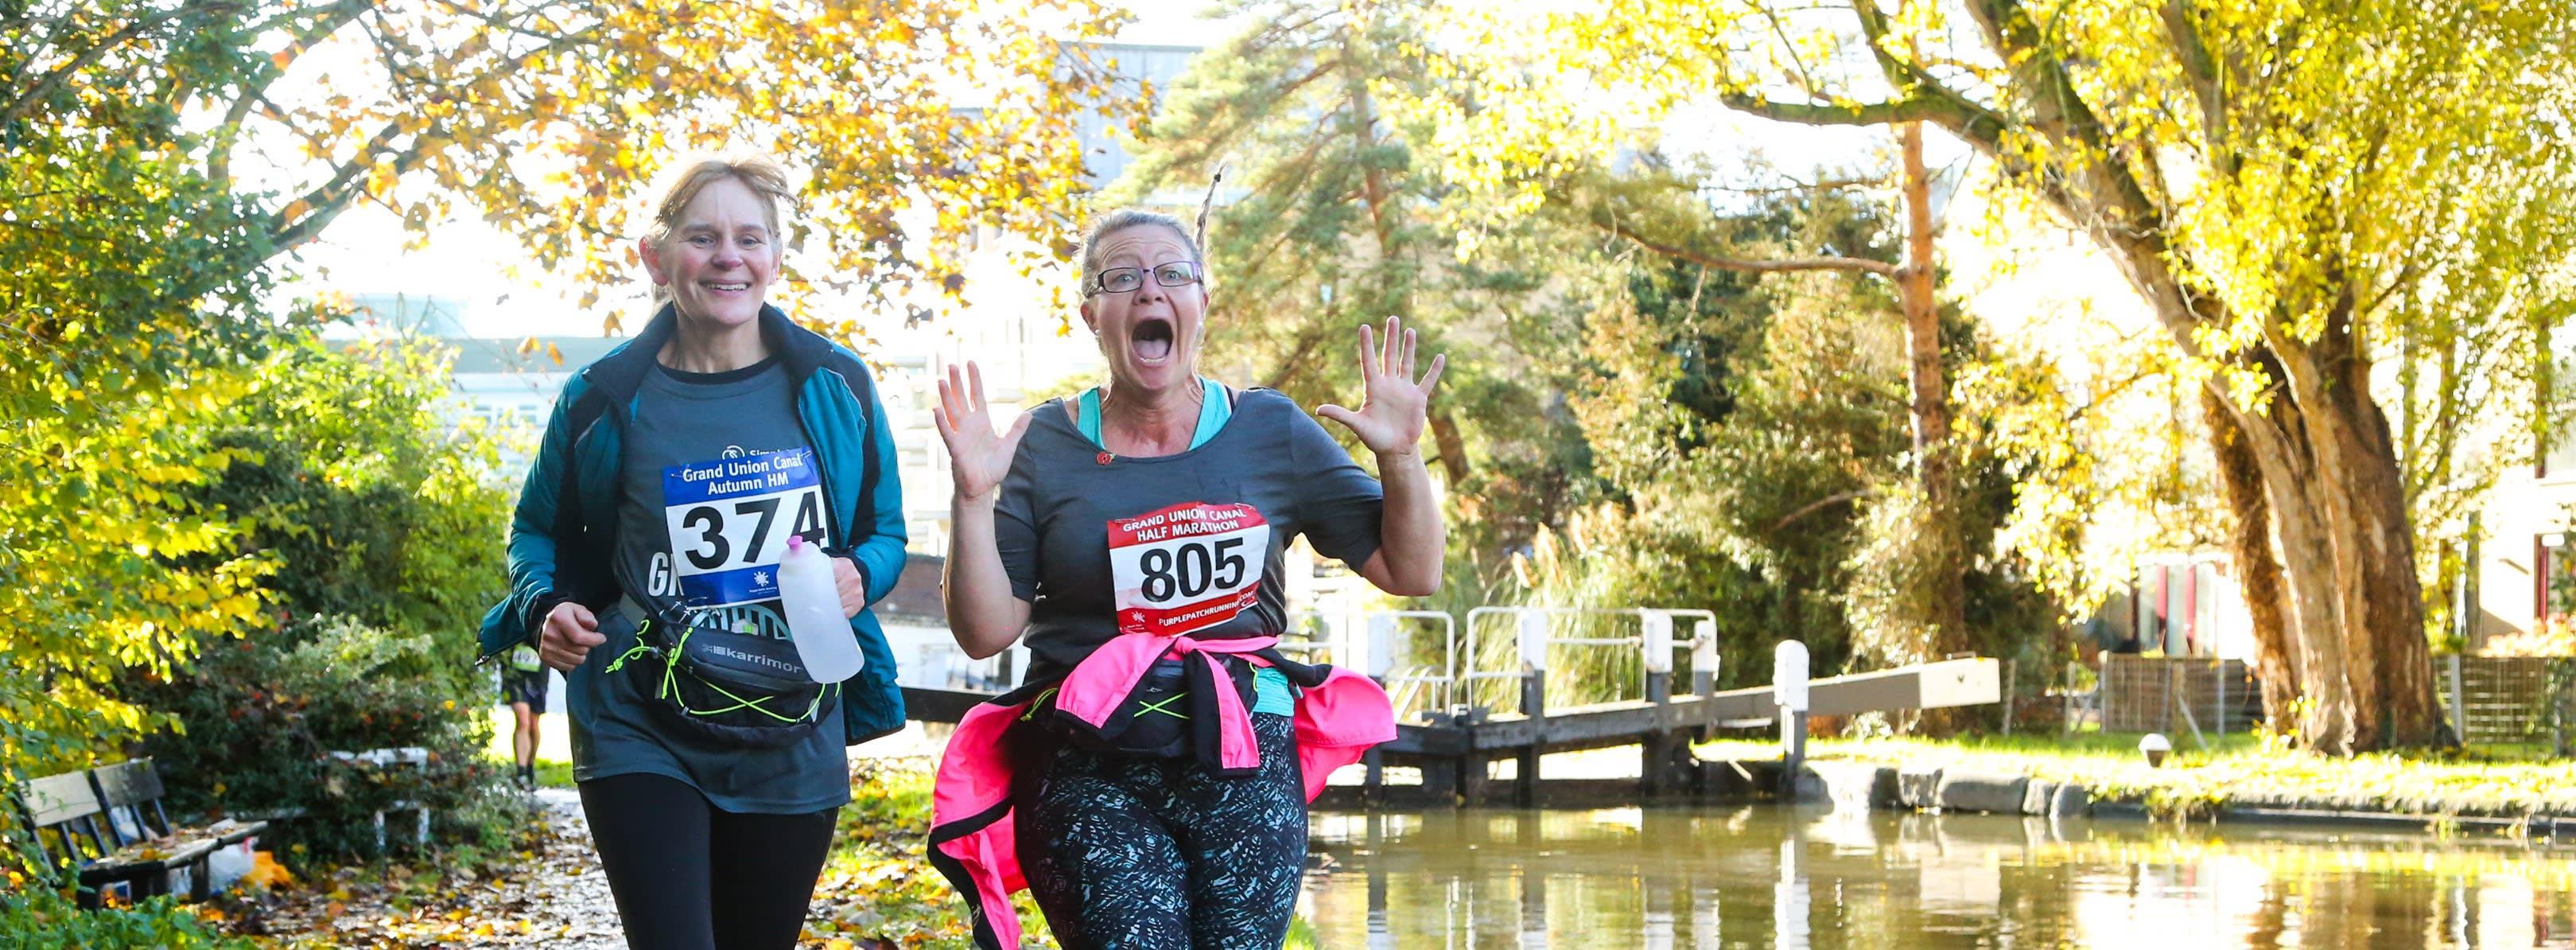 Grand Union Canal Half Marathon Autumn